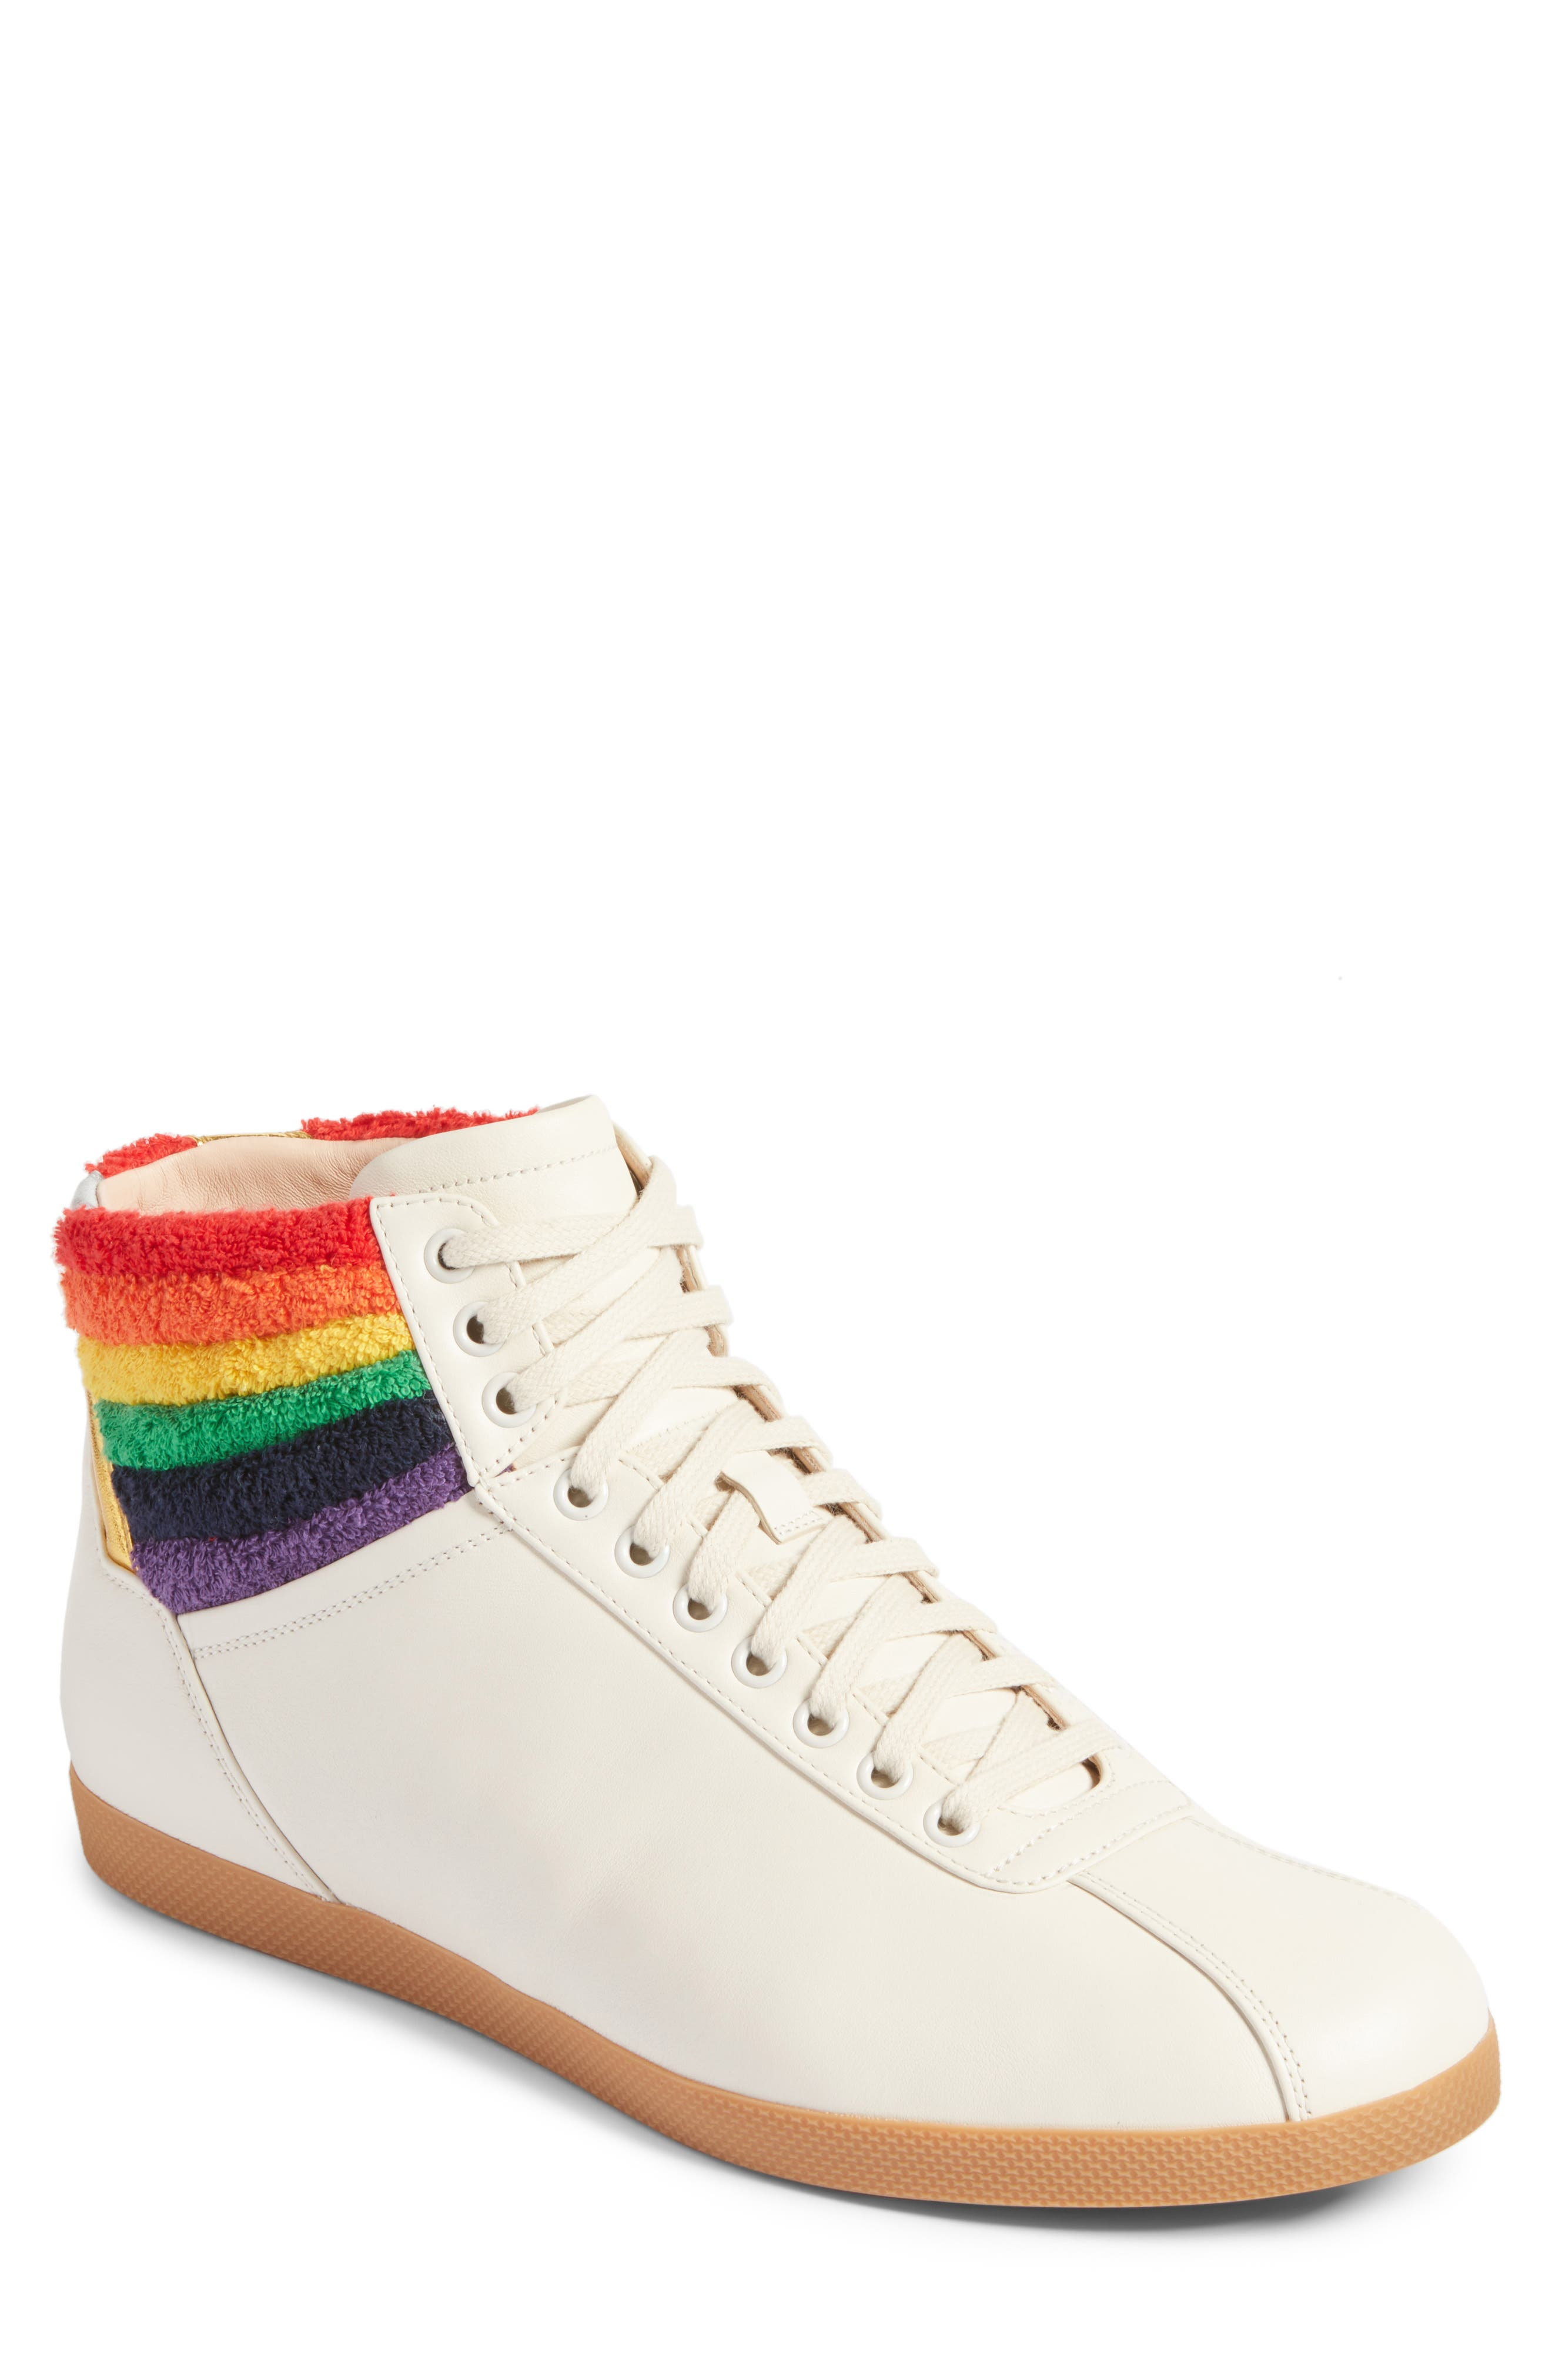 Bambi Rainbow Terry High Top Sneaker,                             Main thumbnail 1, color,